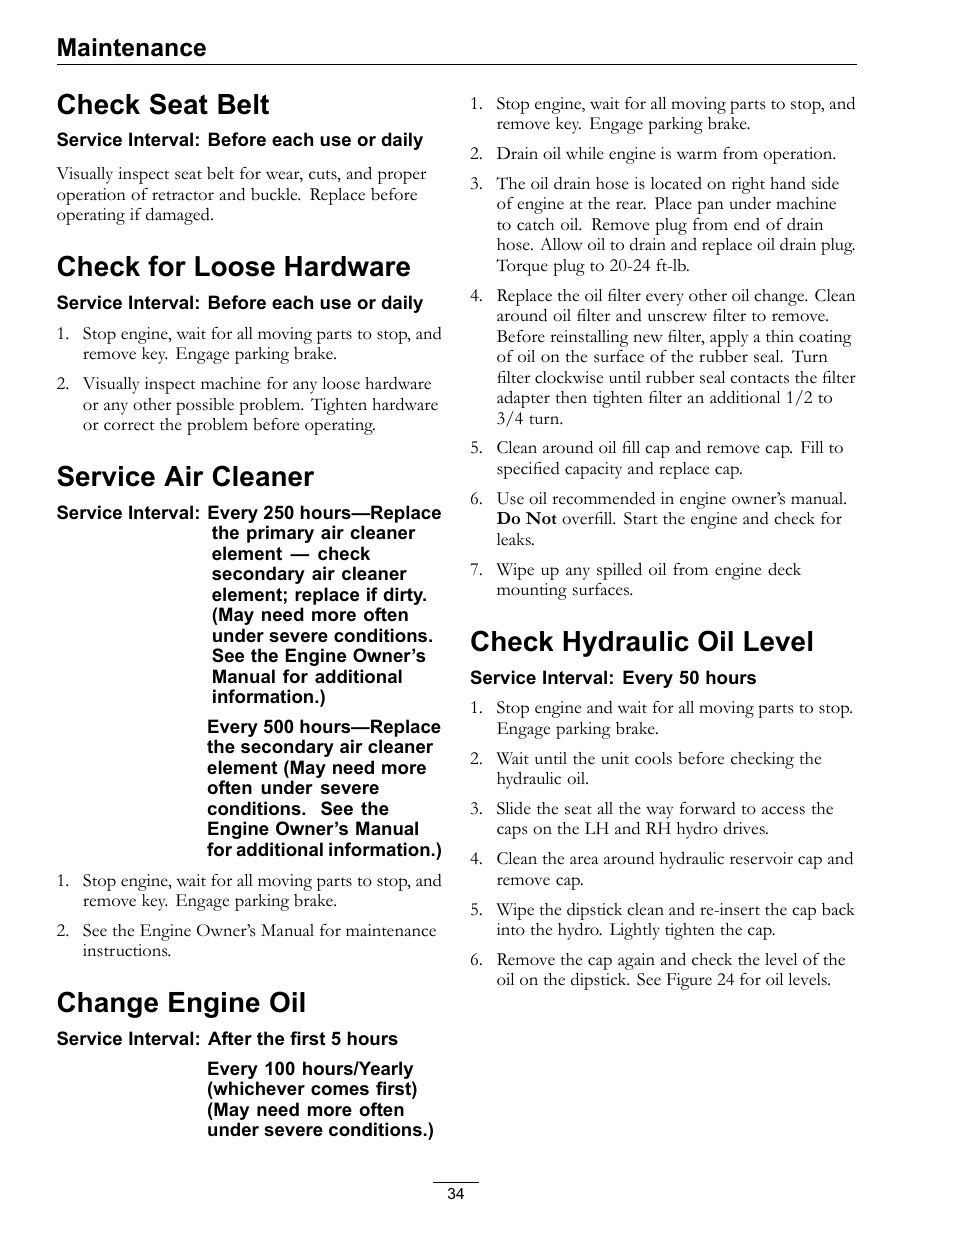 check seat belt check for loose hardware service air cleaner rh manualsdir com exmark lazer z s series service manual 2009 exmark lazer z owners manual